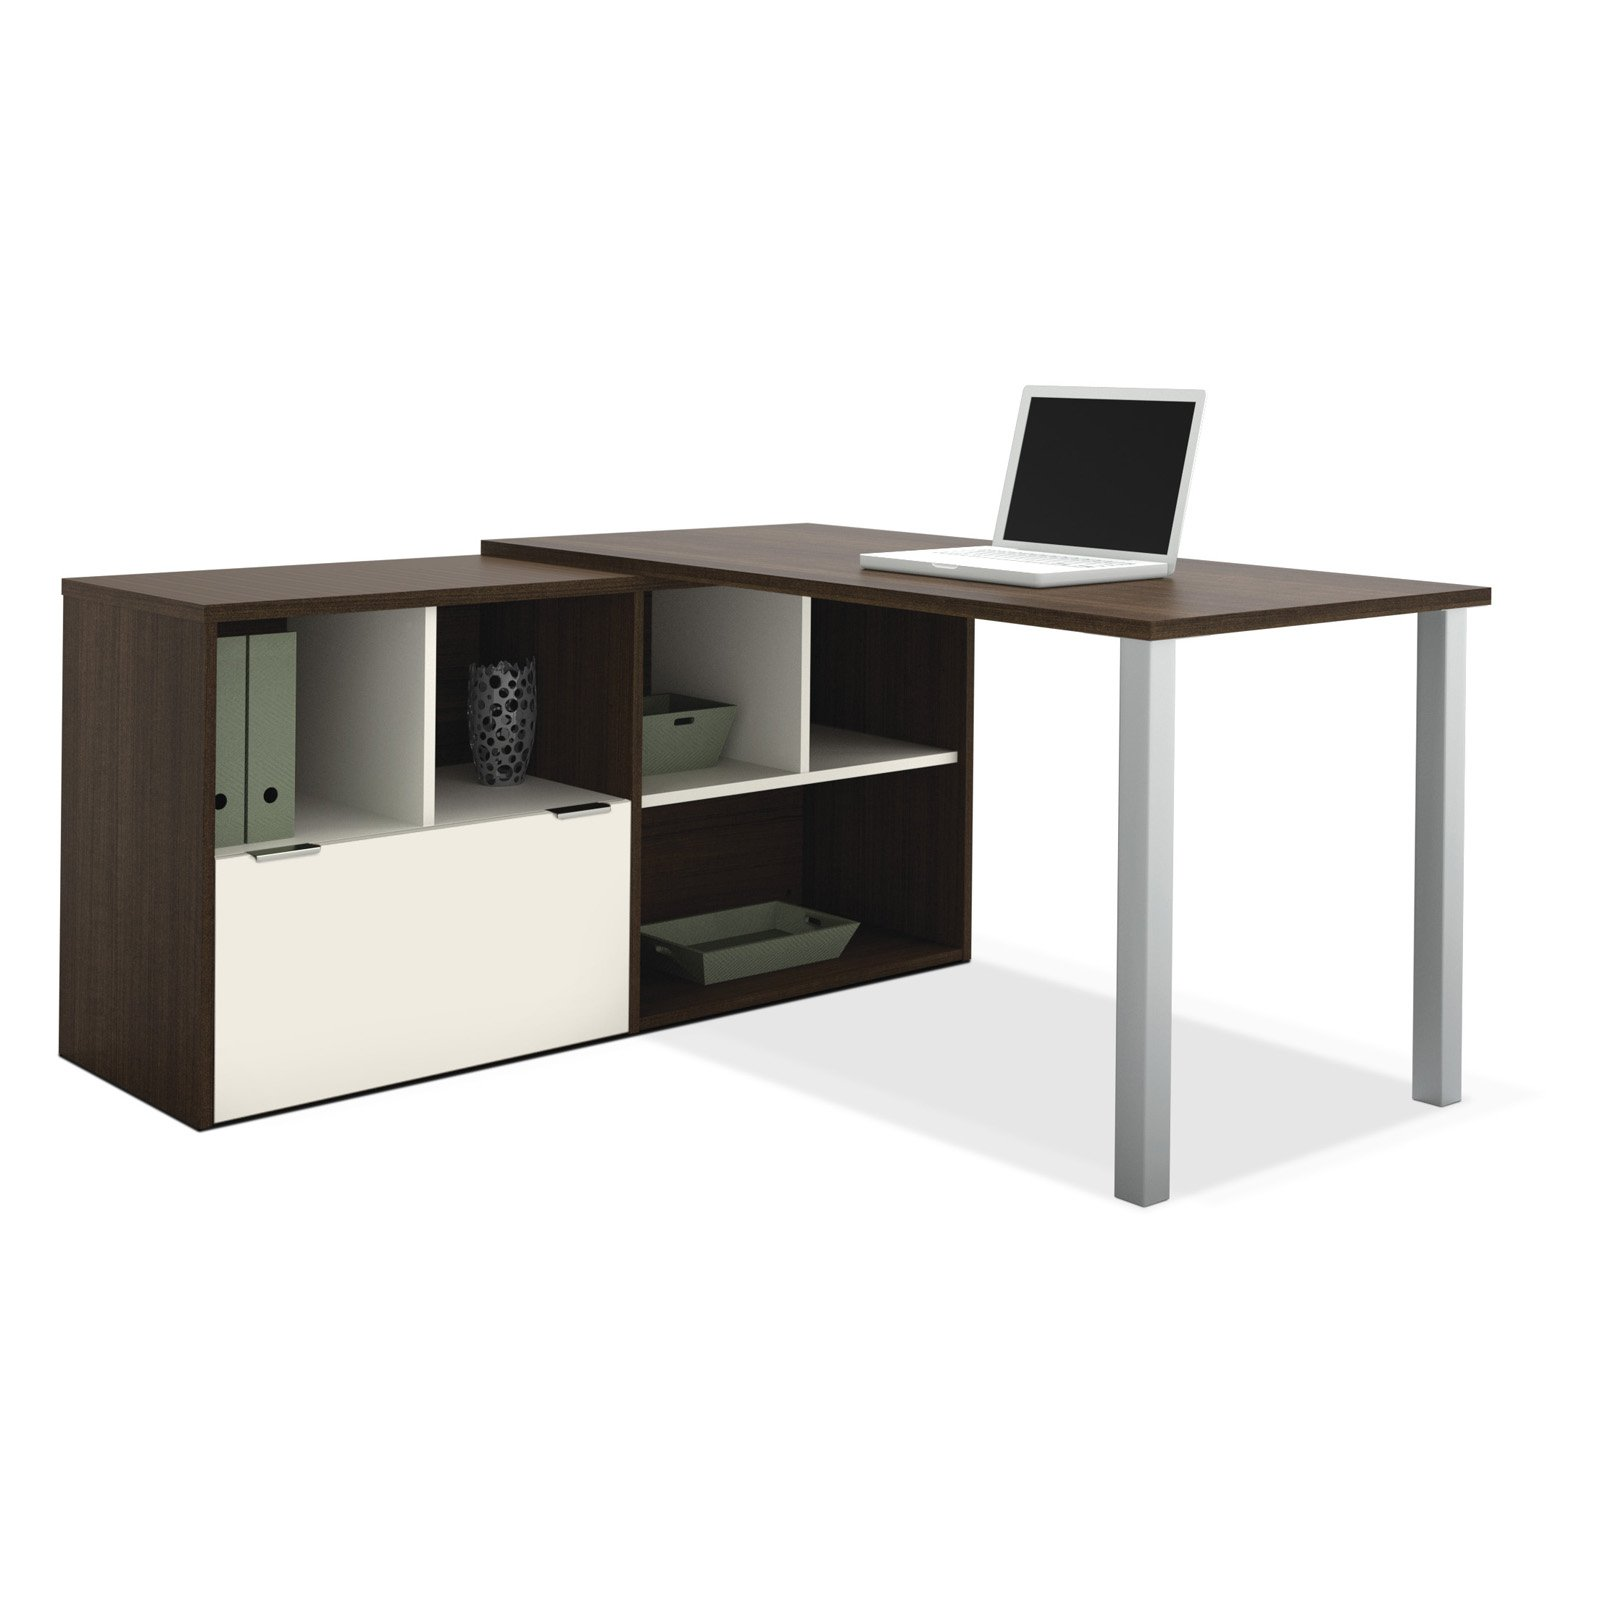 Bestar 50852-60 Contempo L-Shaped Desk Tuxedo   Sandstone by Bestar